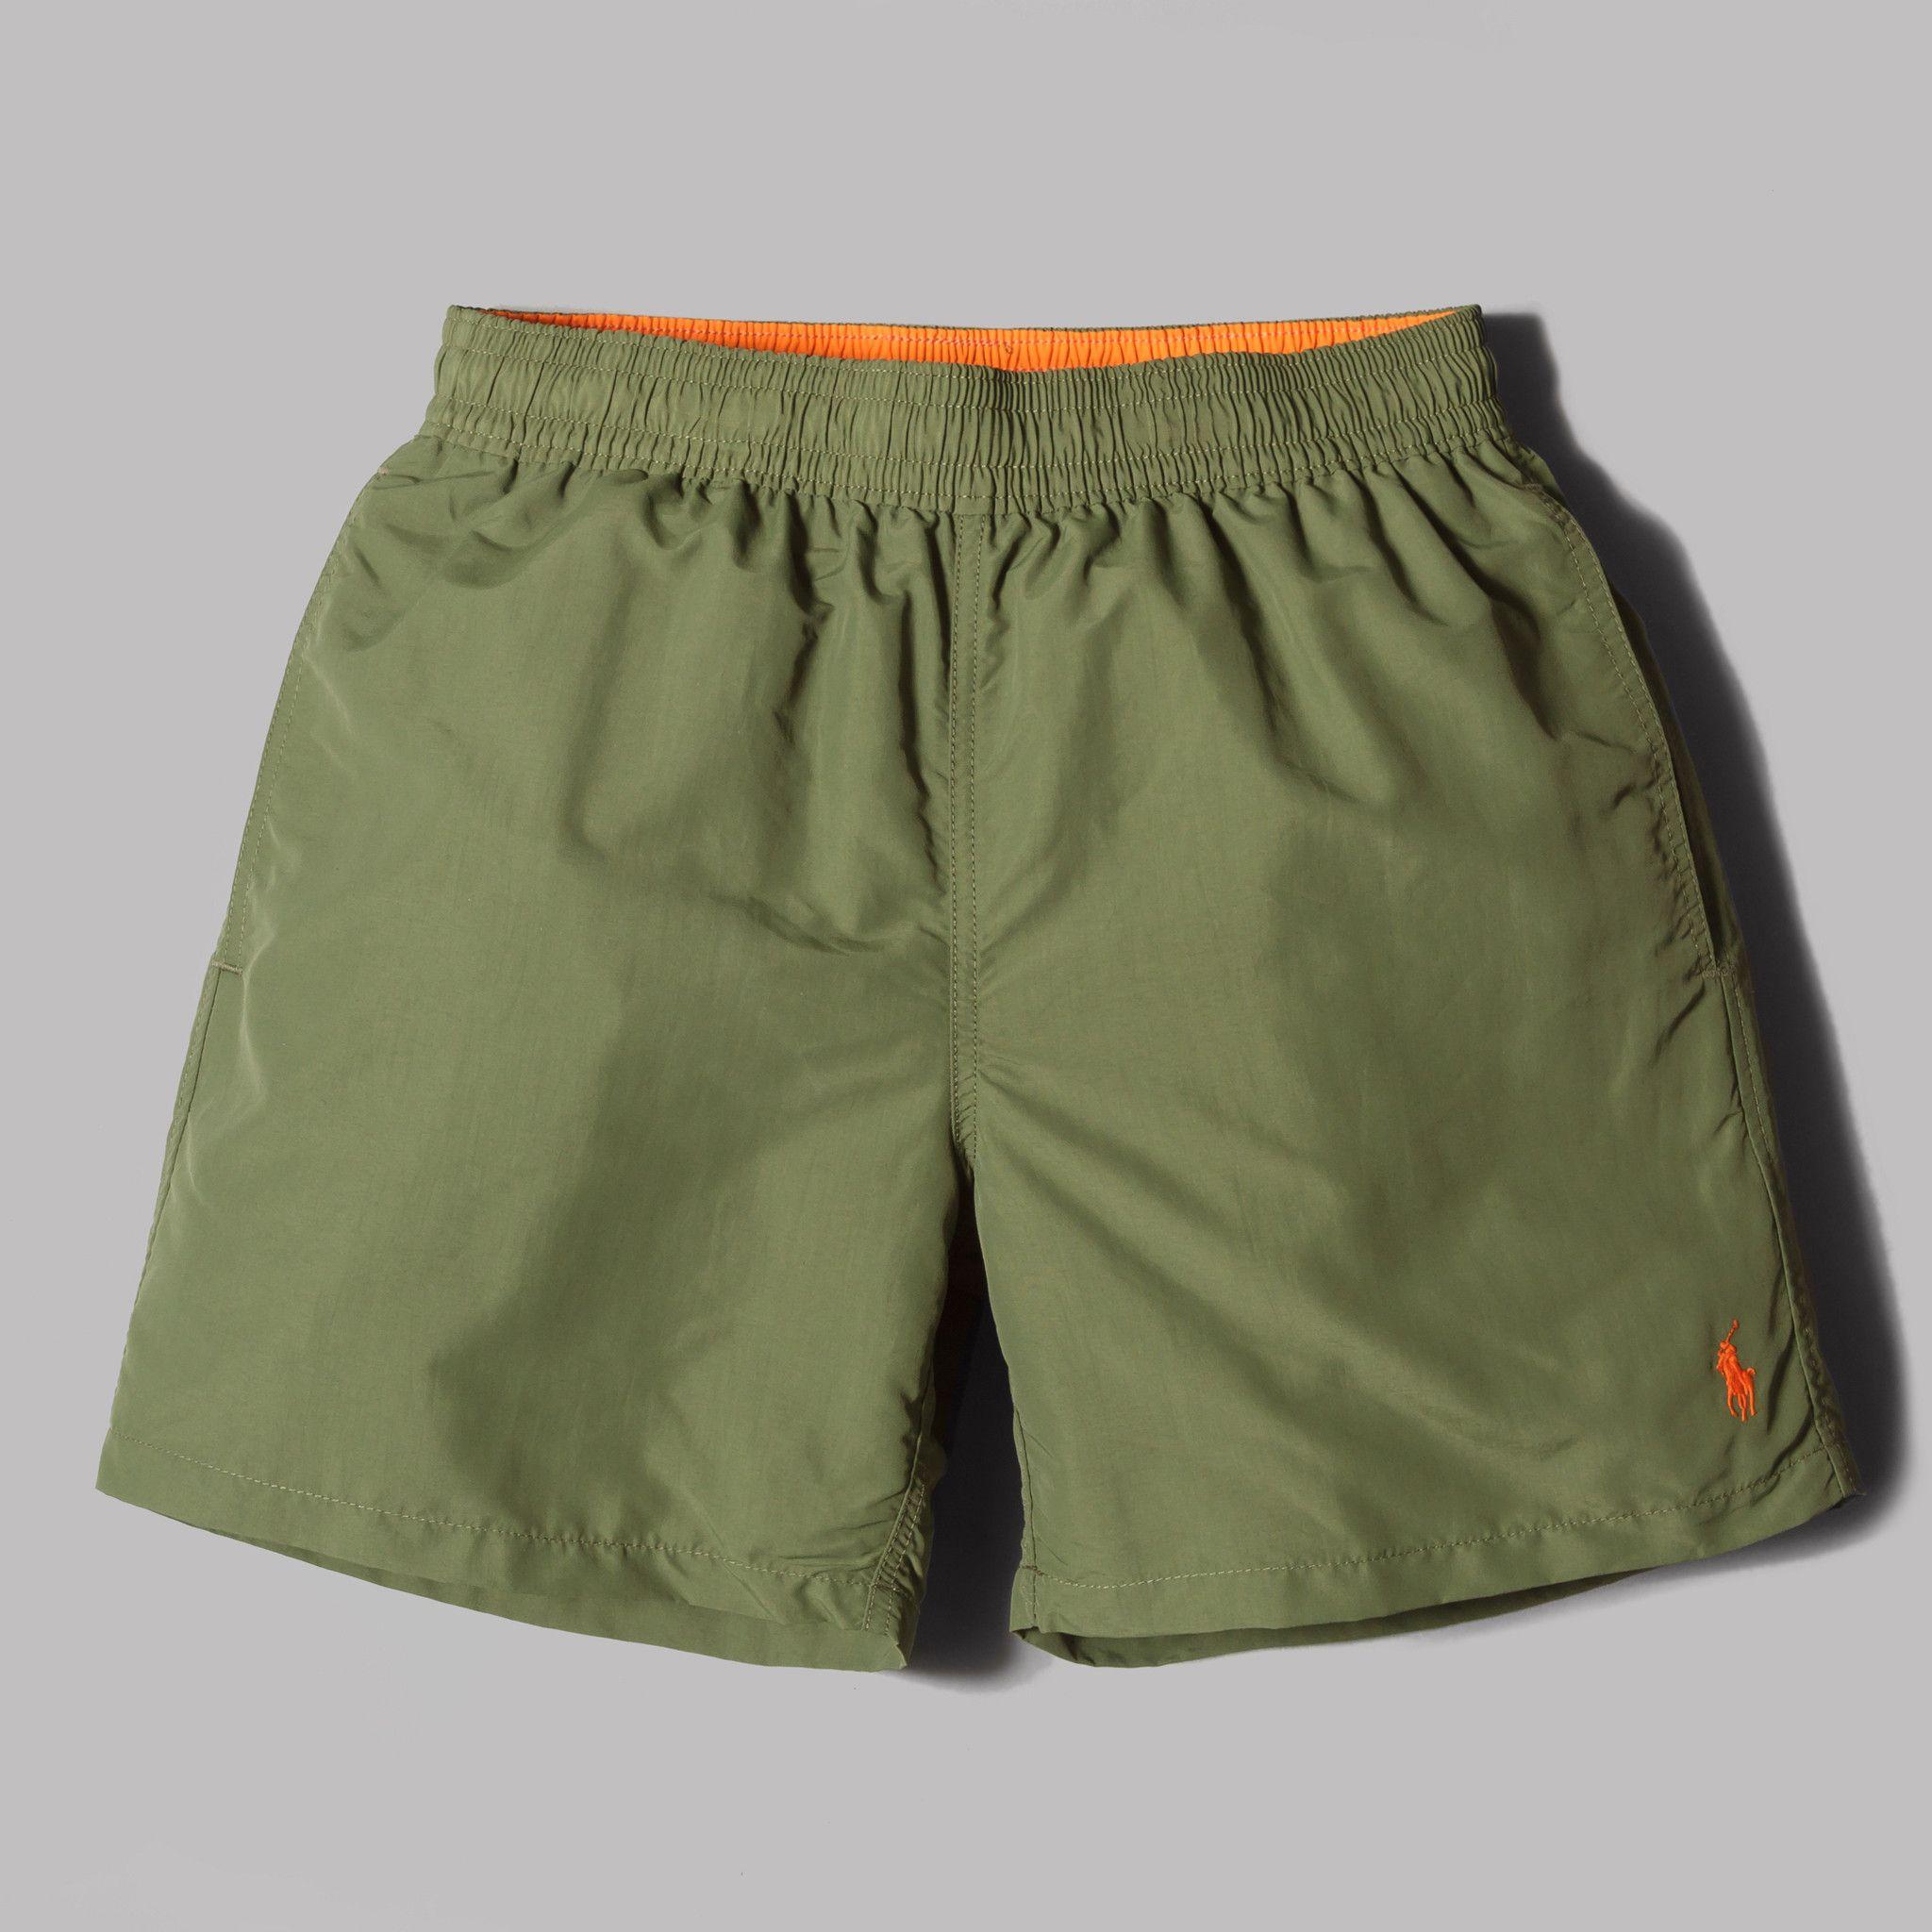 cheap ralph lauren swim shorts uk